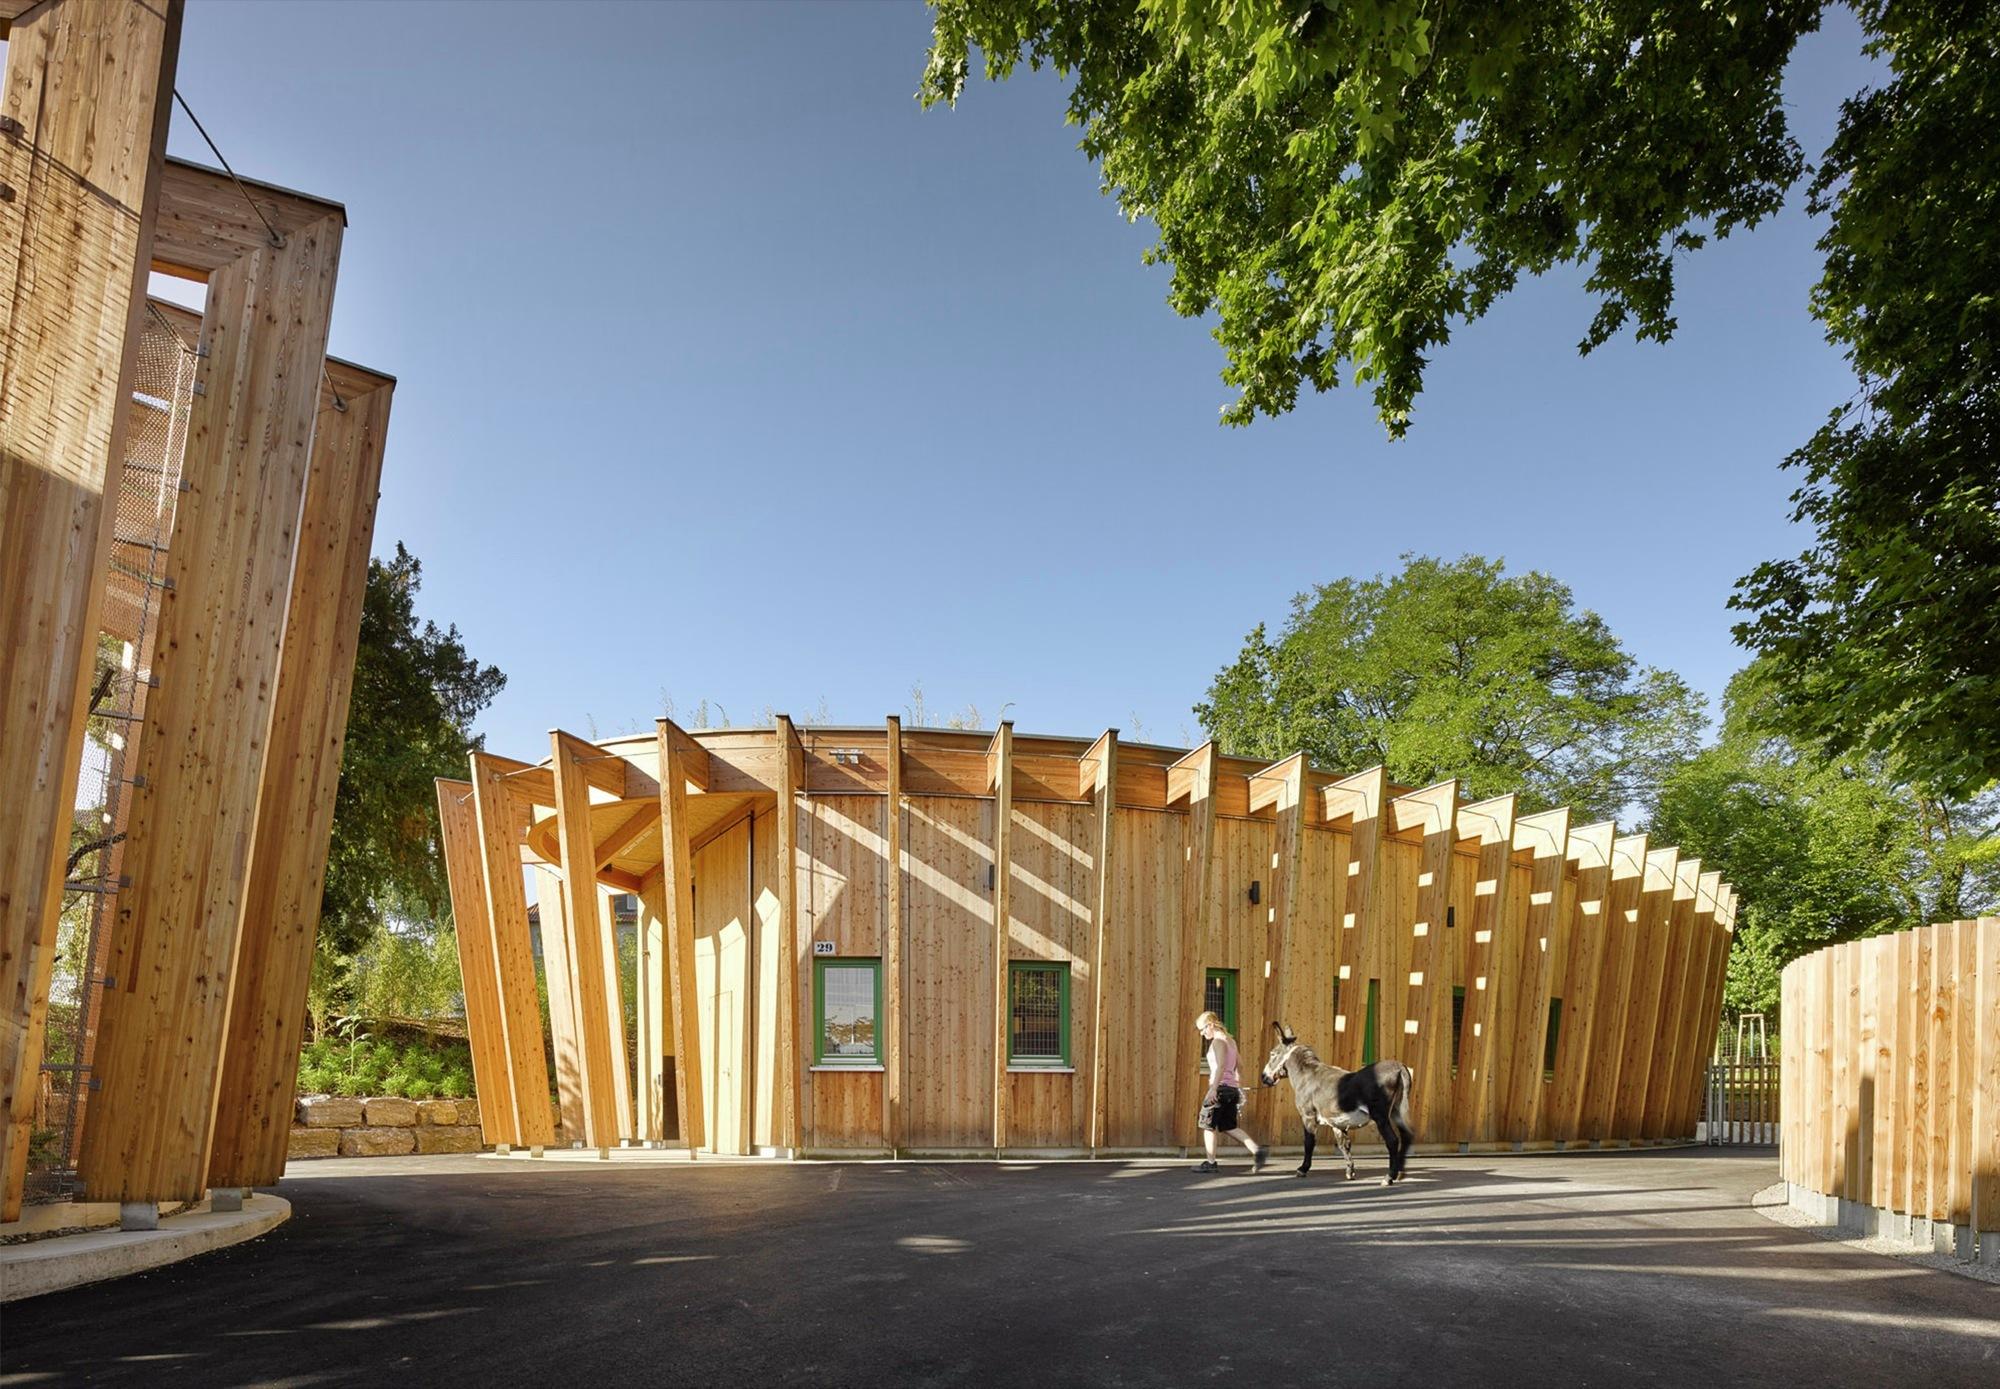 214 Hringen Petting Zoo Kresings Architektur Archdaily